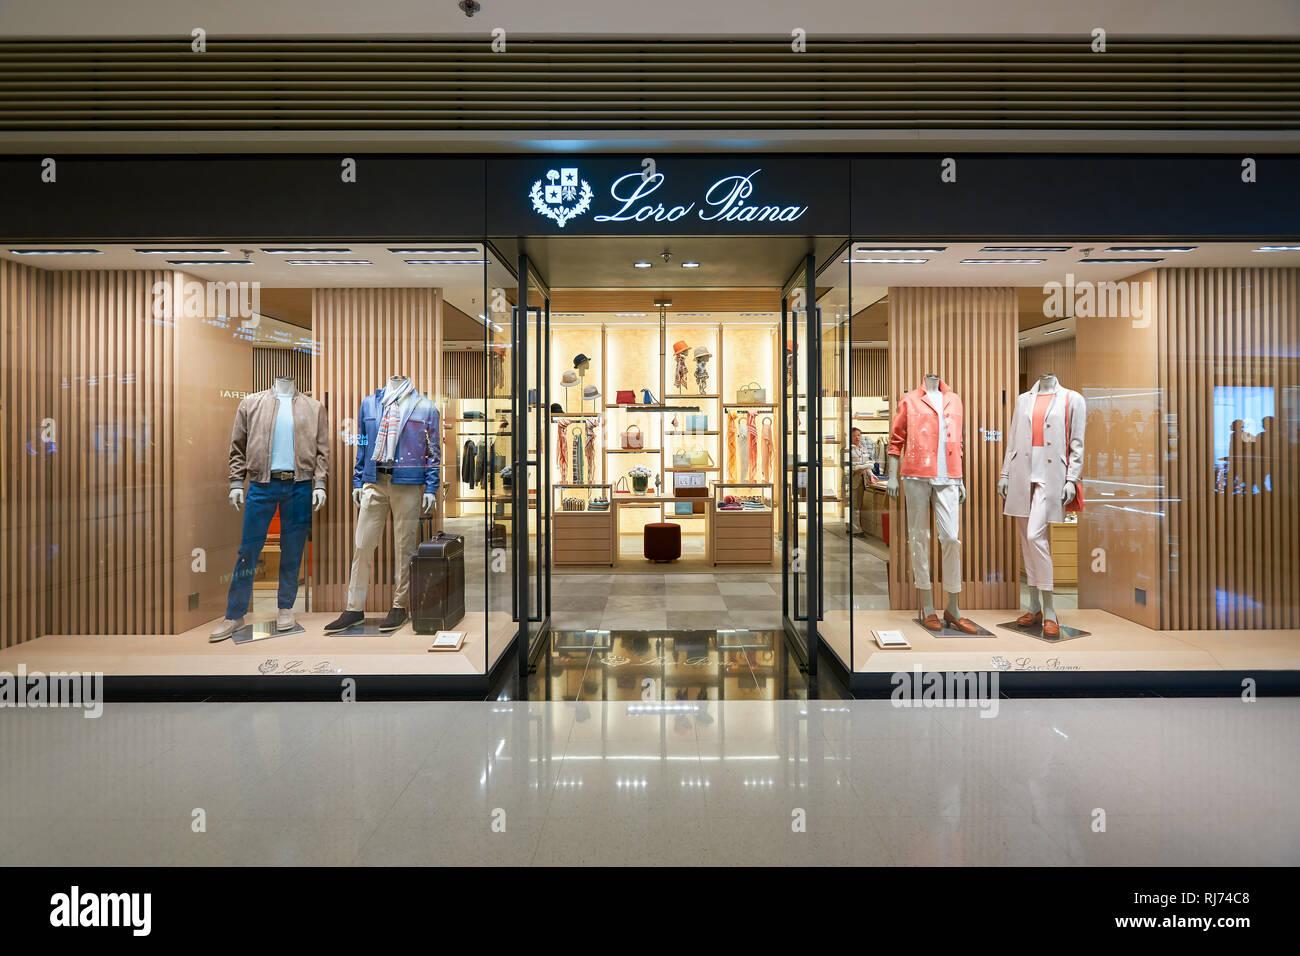 HONG KONG - JANUARY 26, 2016: Loro Piana store at Elements Shopping Mall. Loro Piana is an Italian clothing company specialising in high-end, luxury c Stock Photo